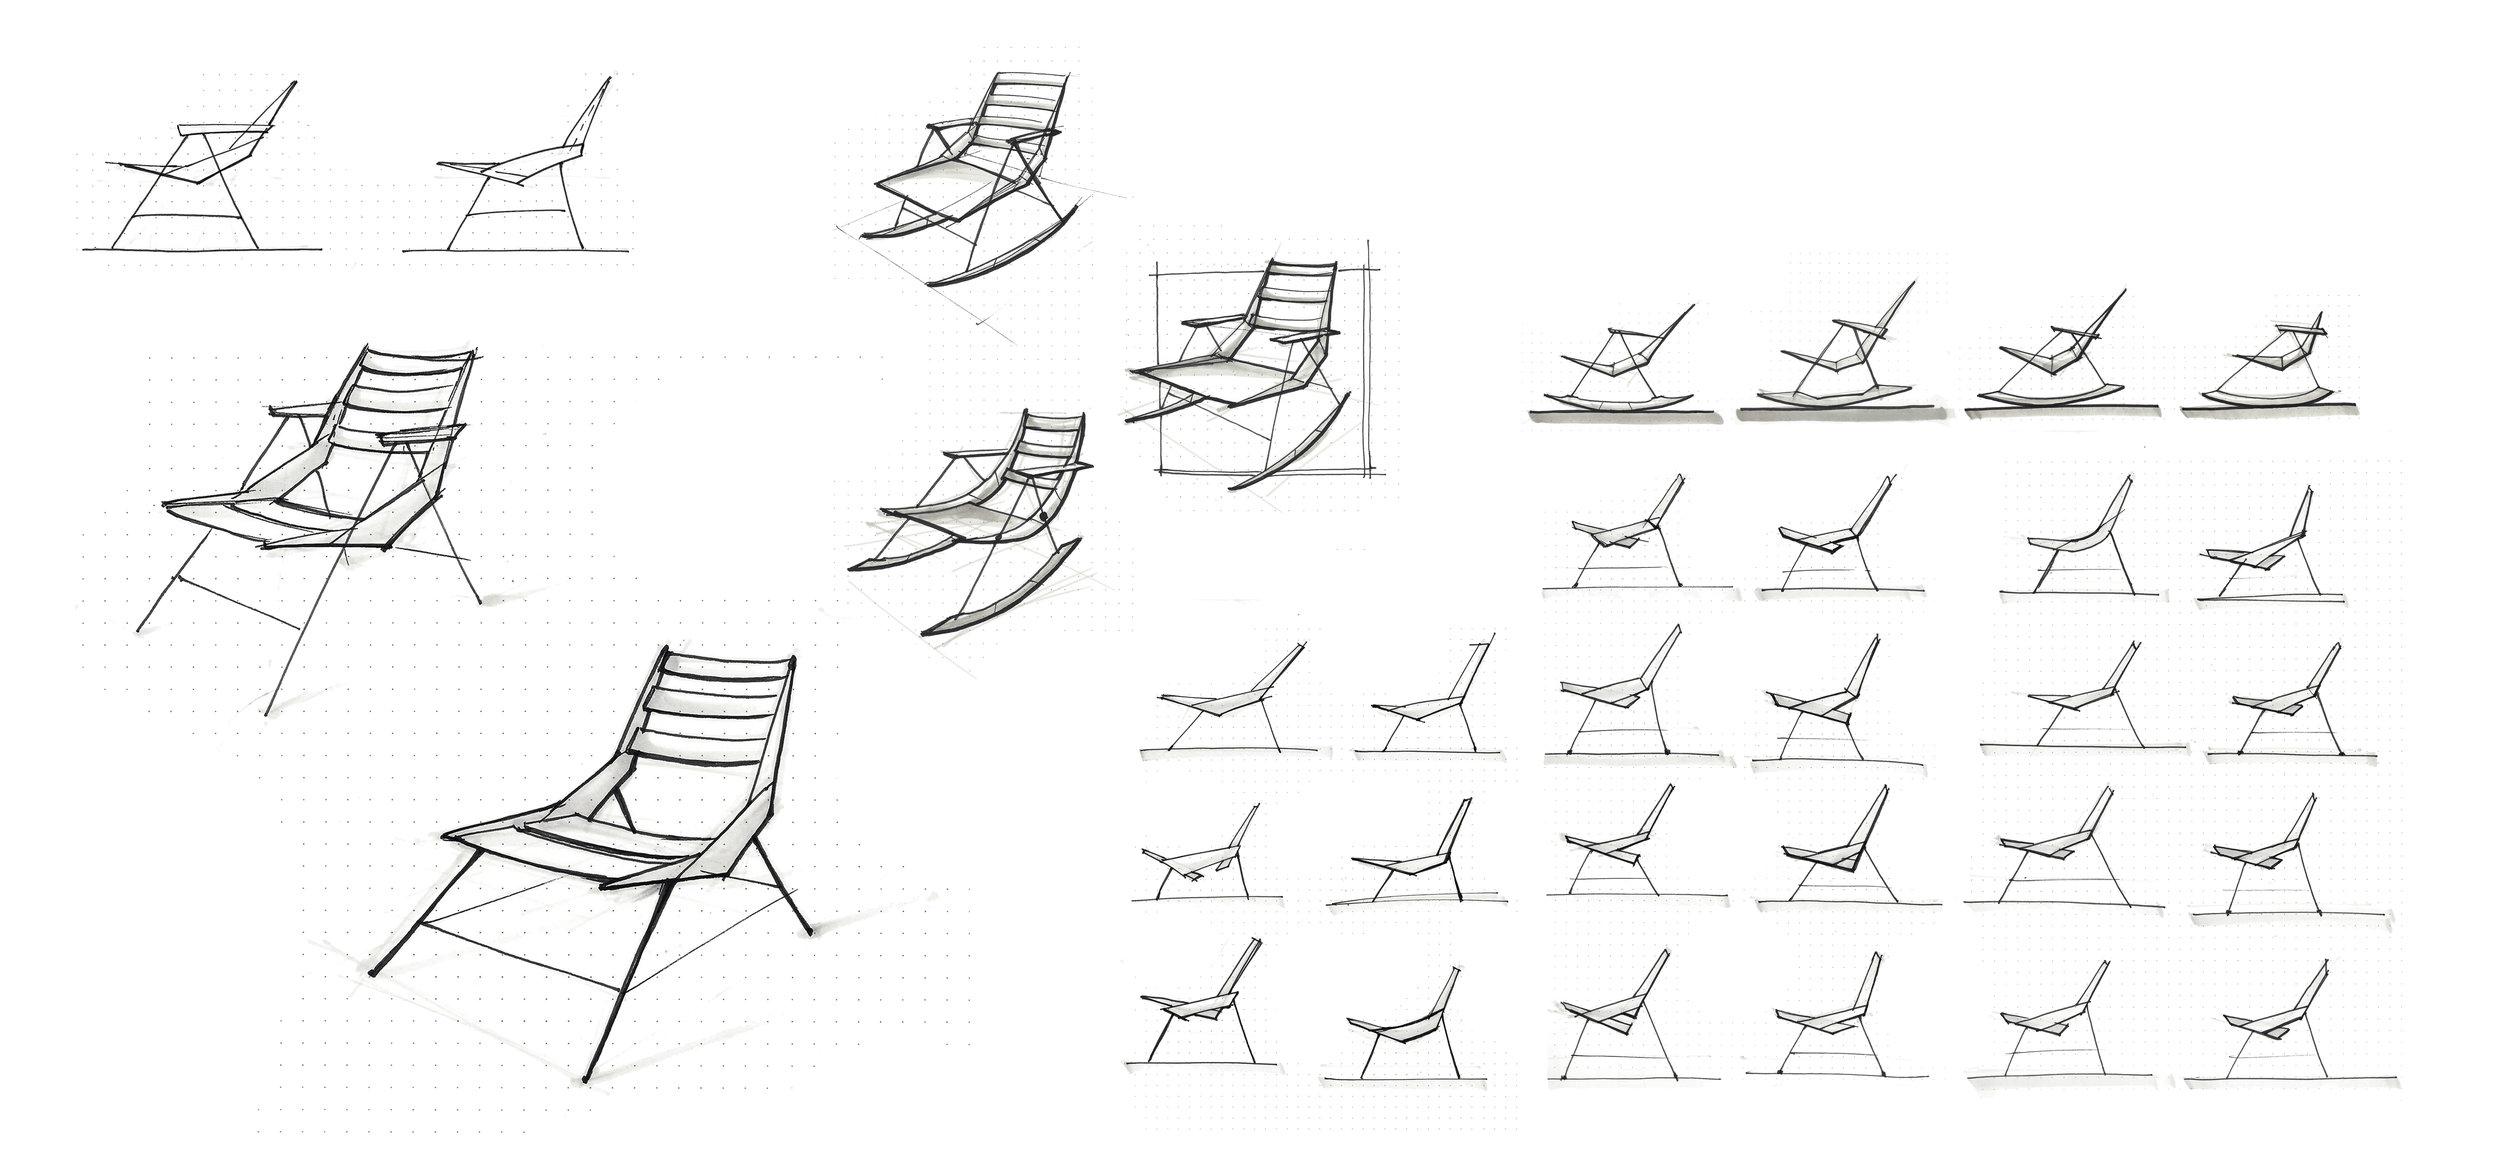 Layout of ortho chair sketchesArtboard 1.jpg